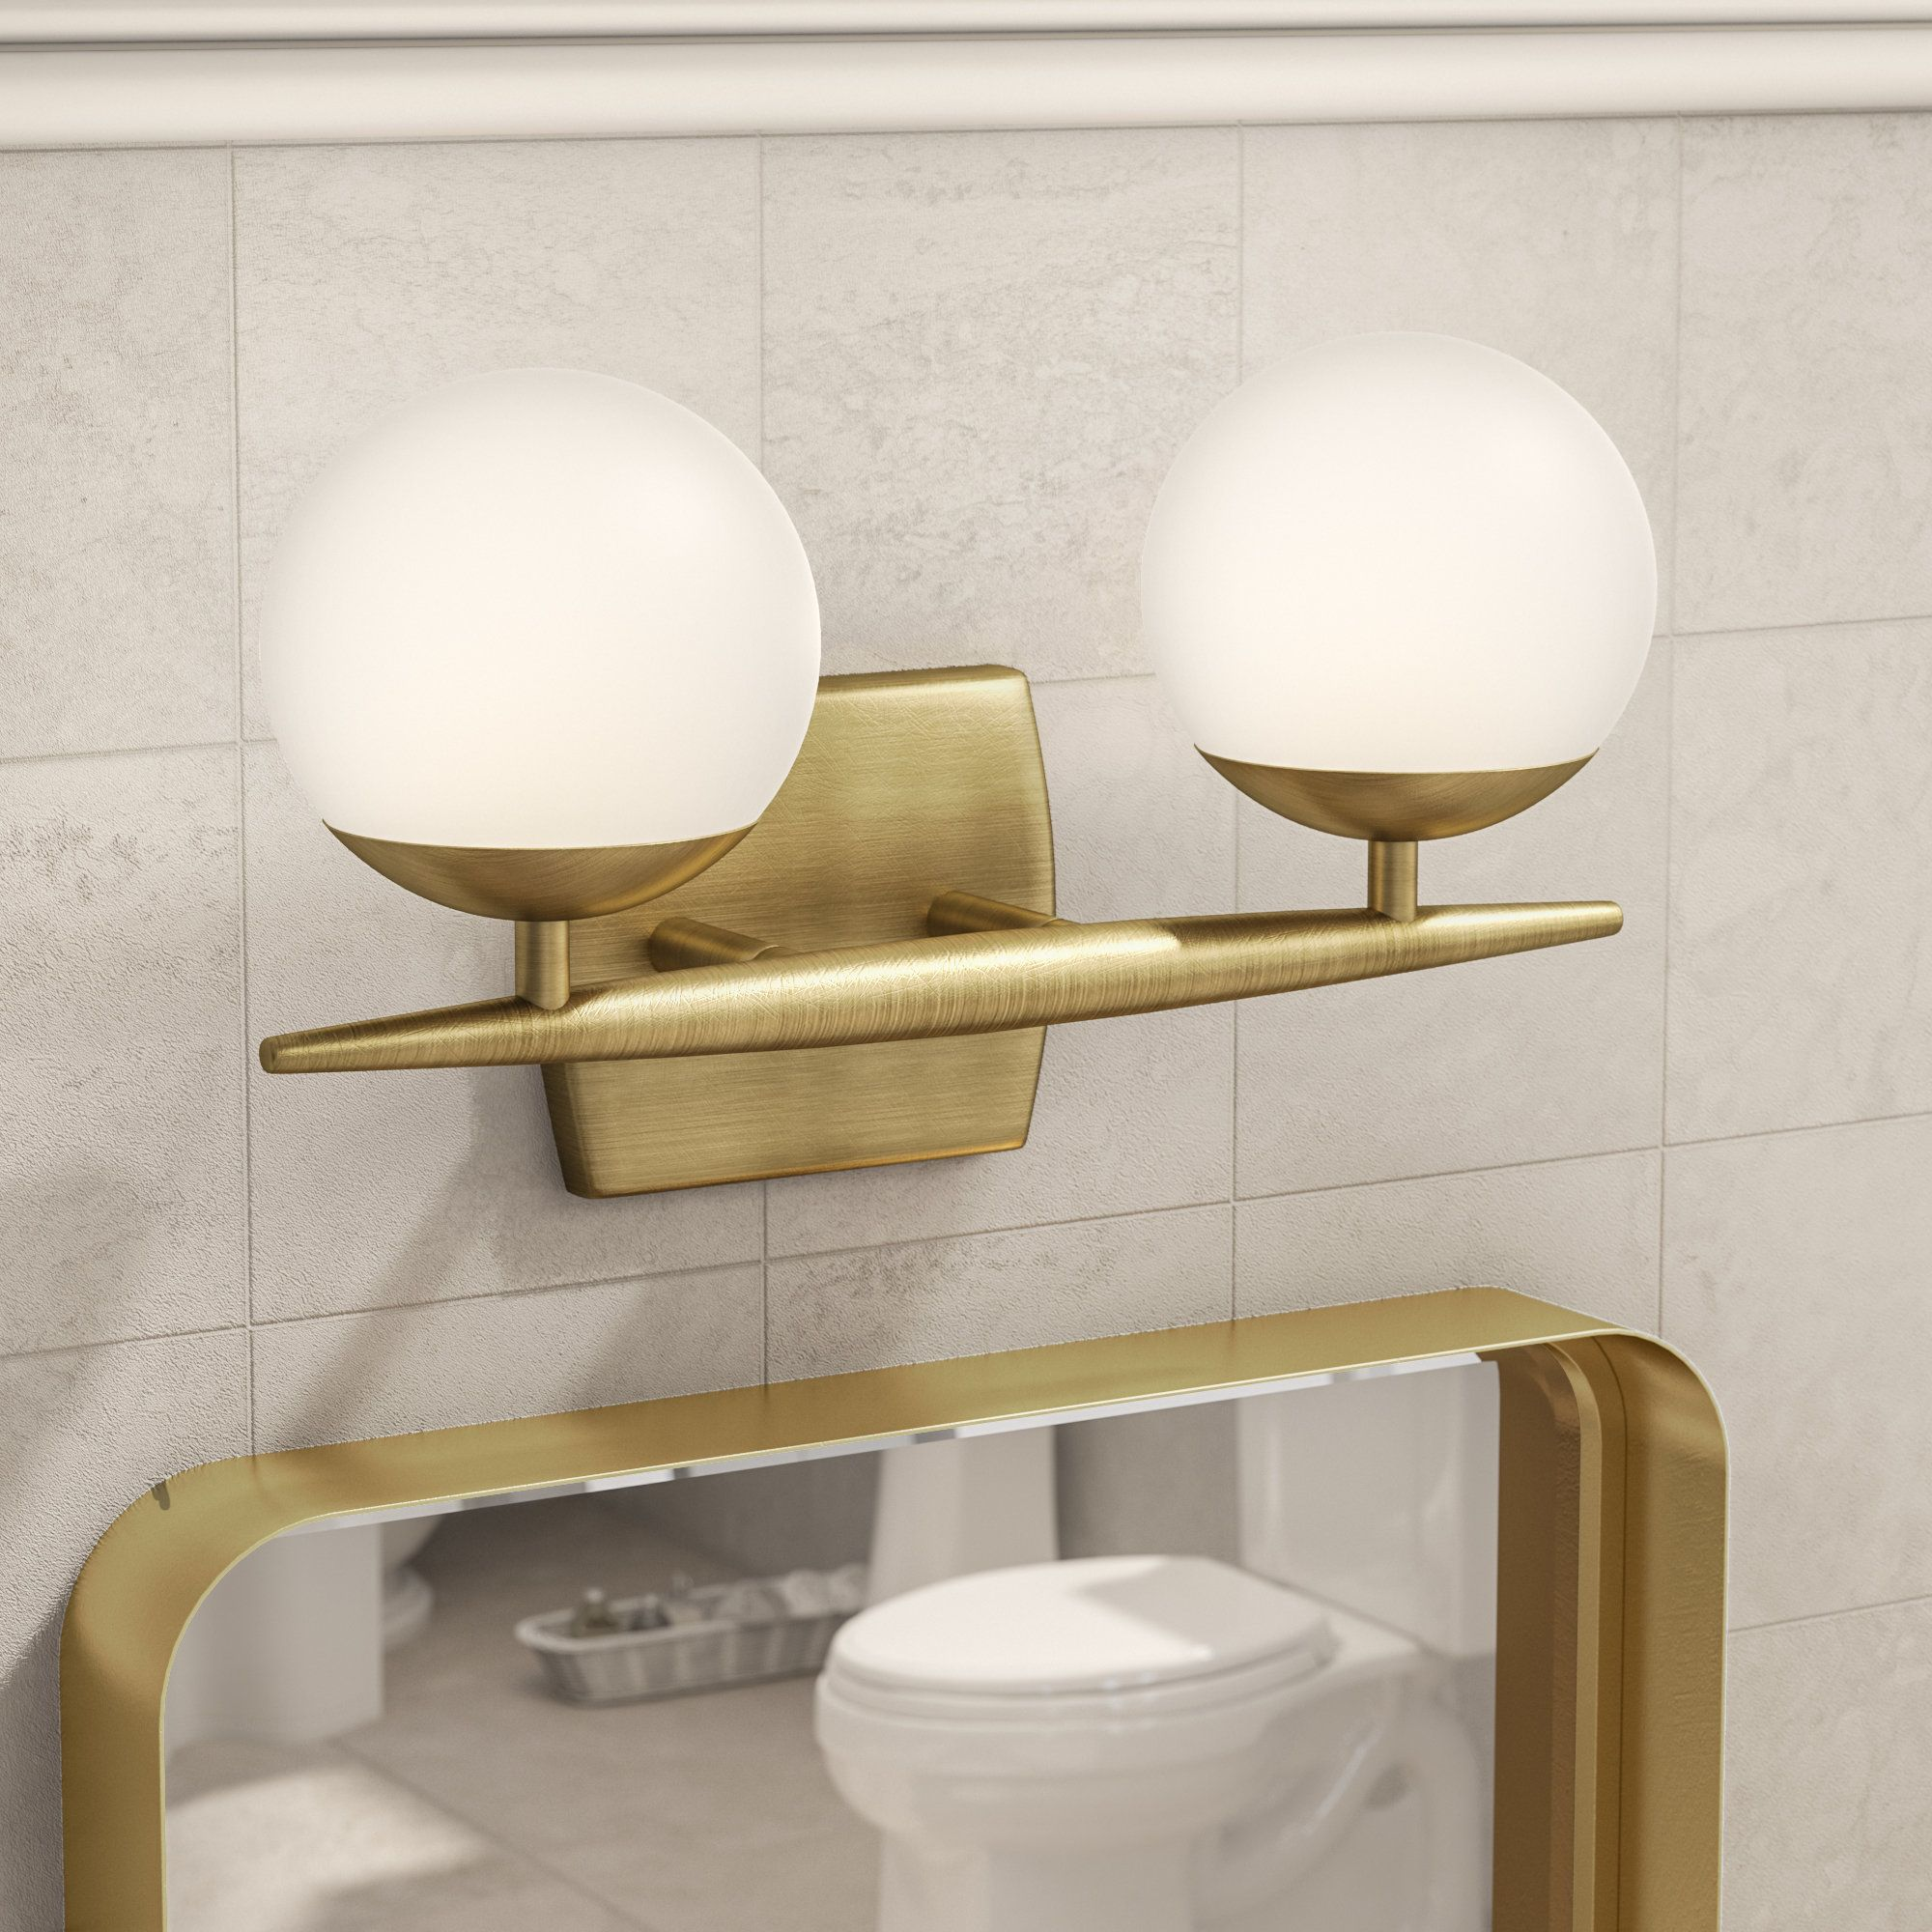 Tasha 2Light Vanity Light Joss & Main Bathroom decor